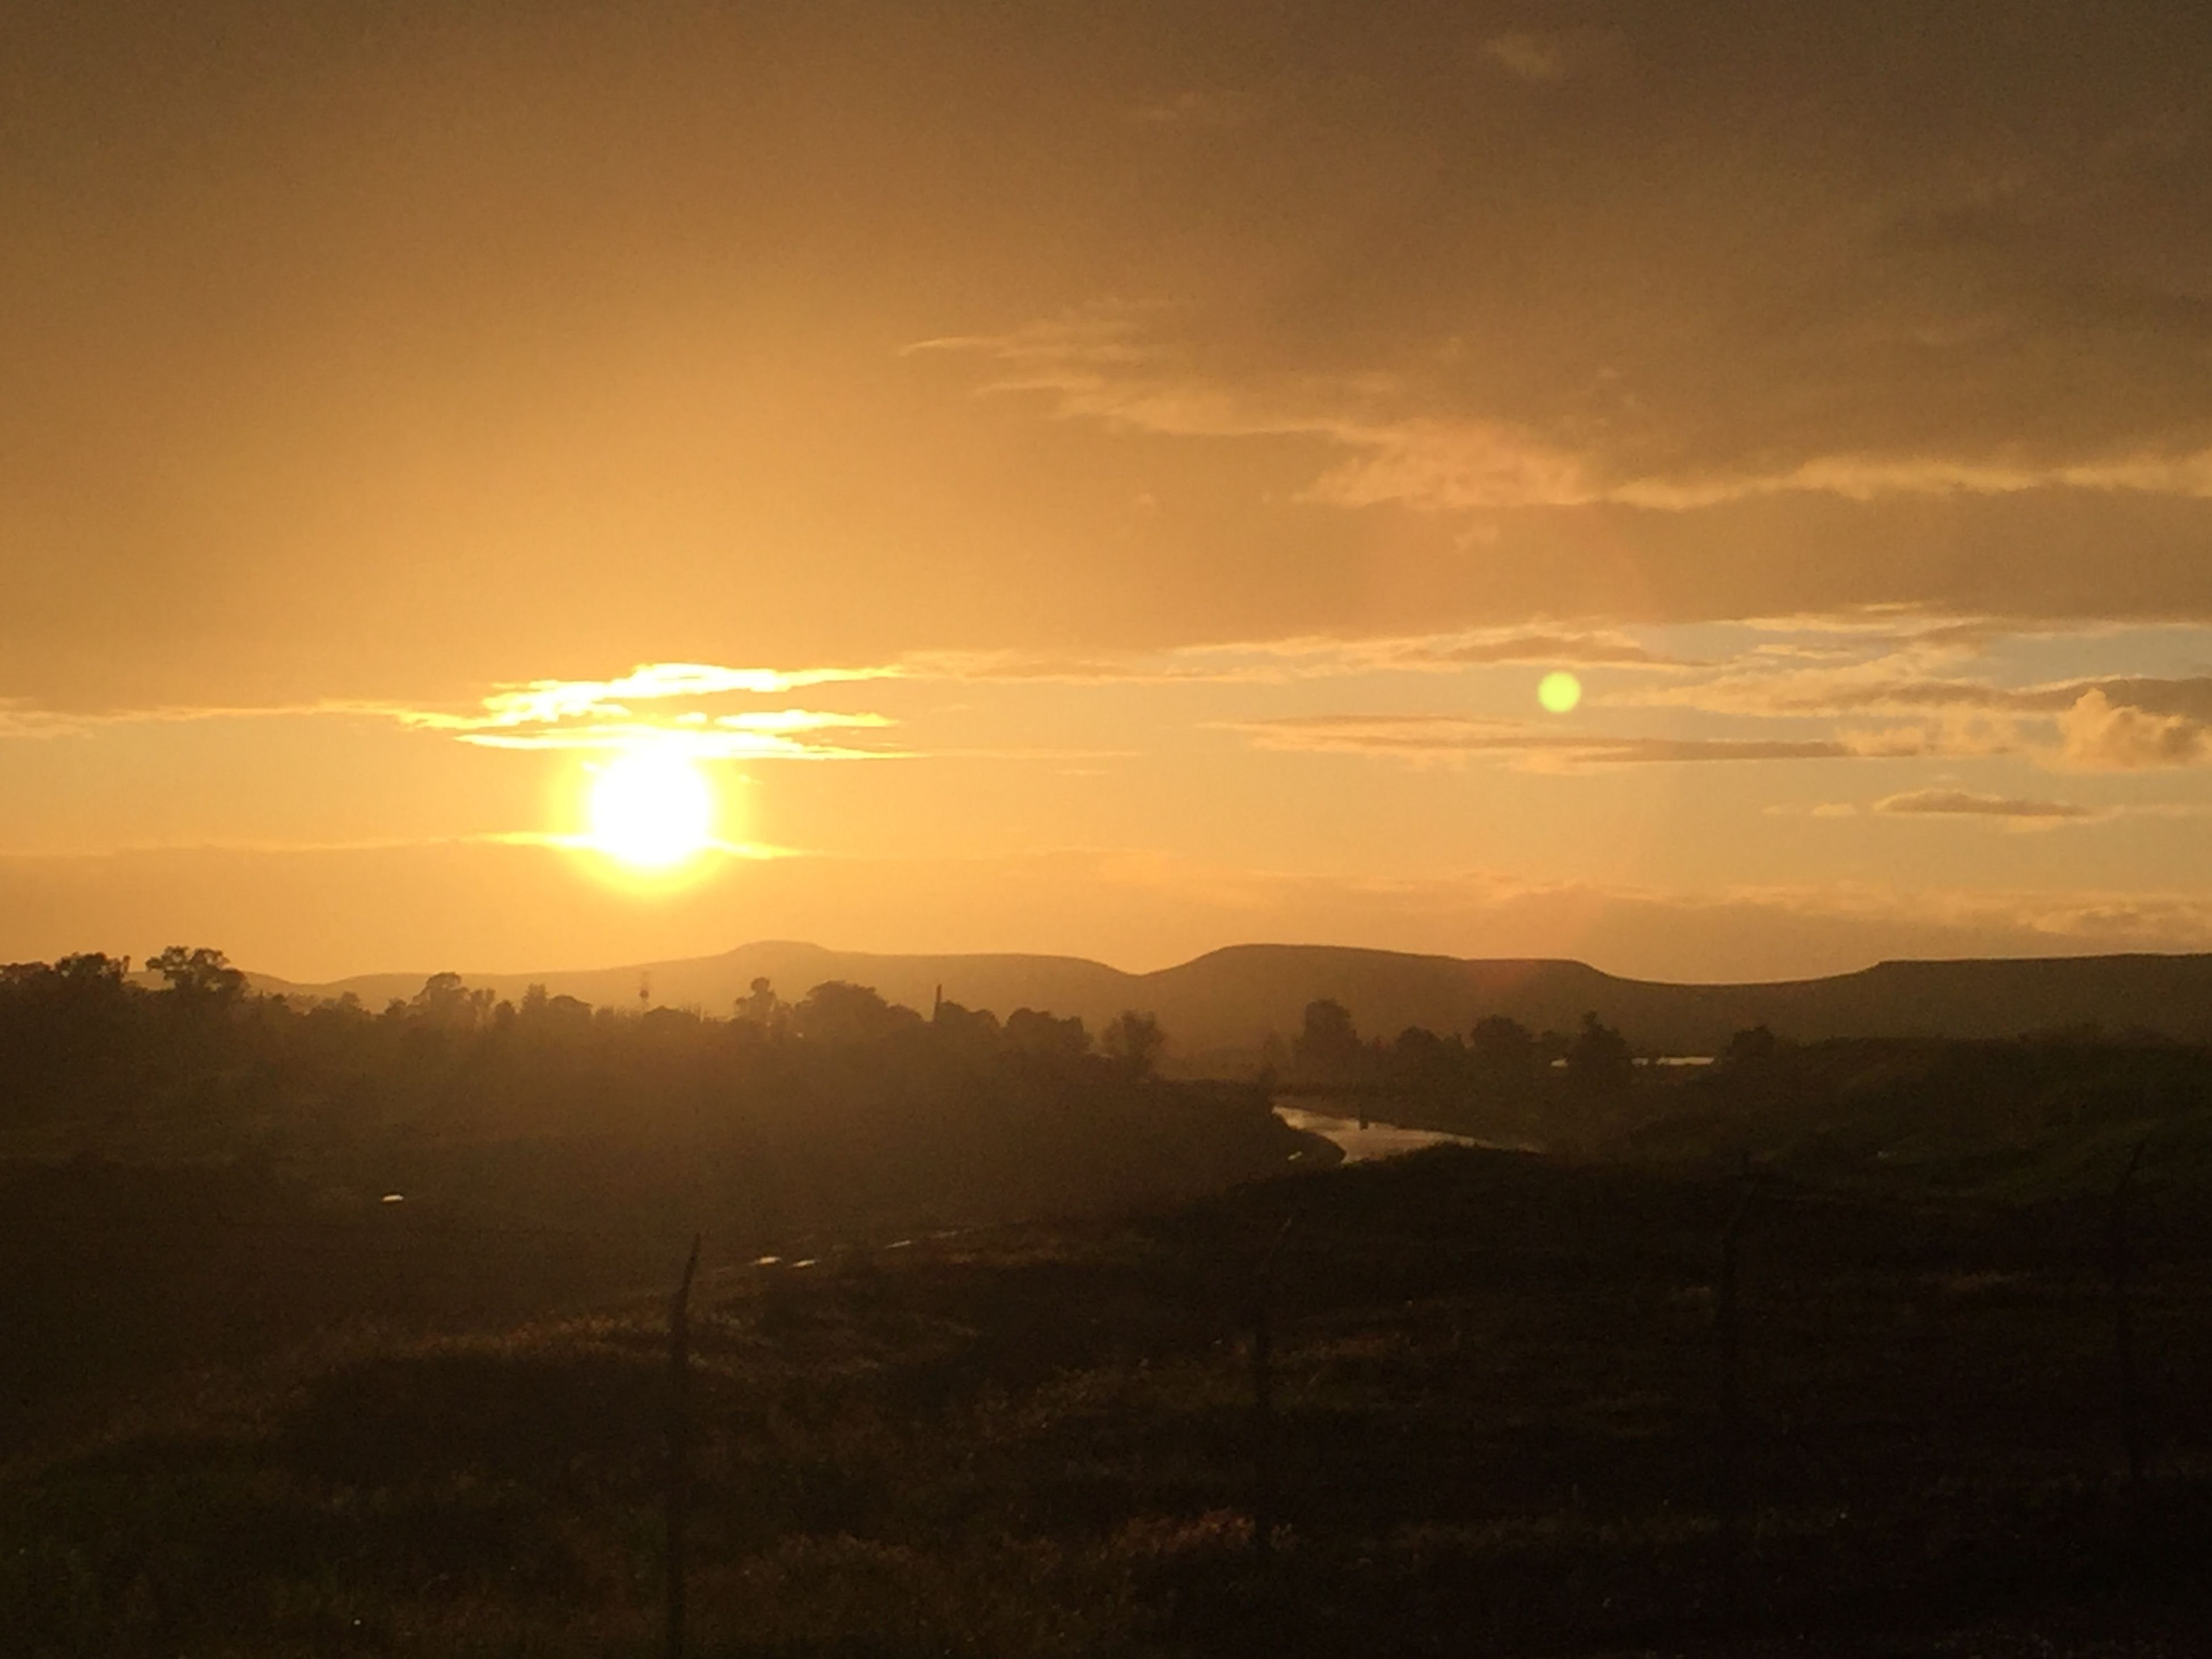 sunset, sun, tranquil scene, scenics, tranquility, sky, beauty in nature, silhouette, landscape, sunbeam, sunlight, nature, mountain, idyllic, orange color, cloud - sky, lens flare, field, cloud, mountain range